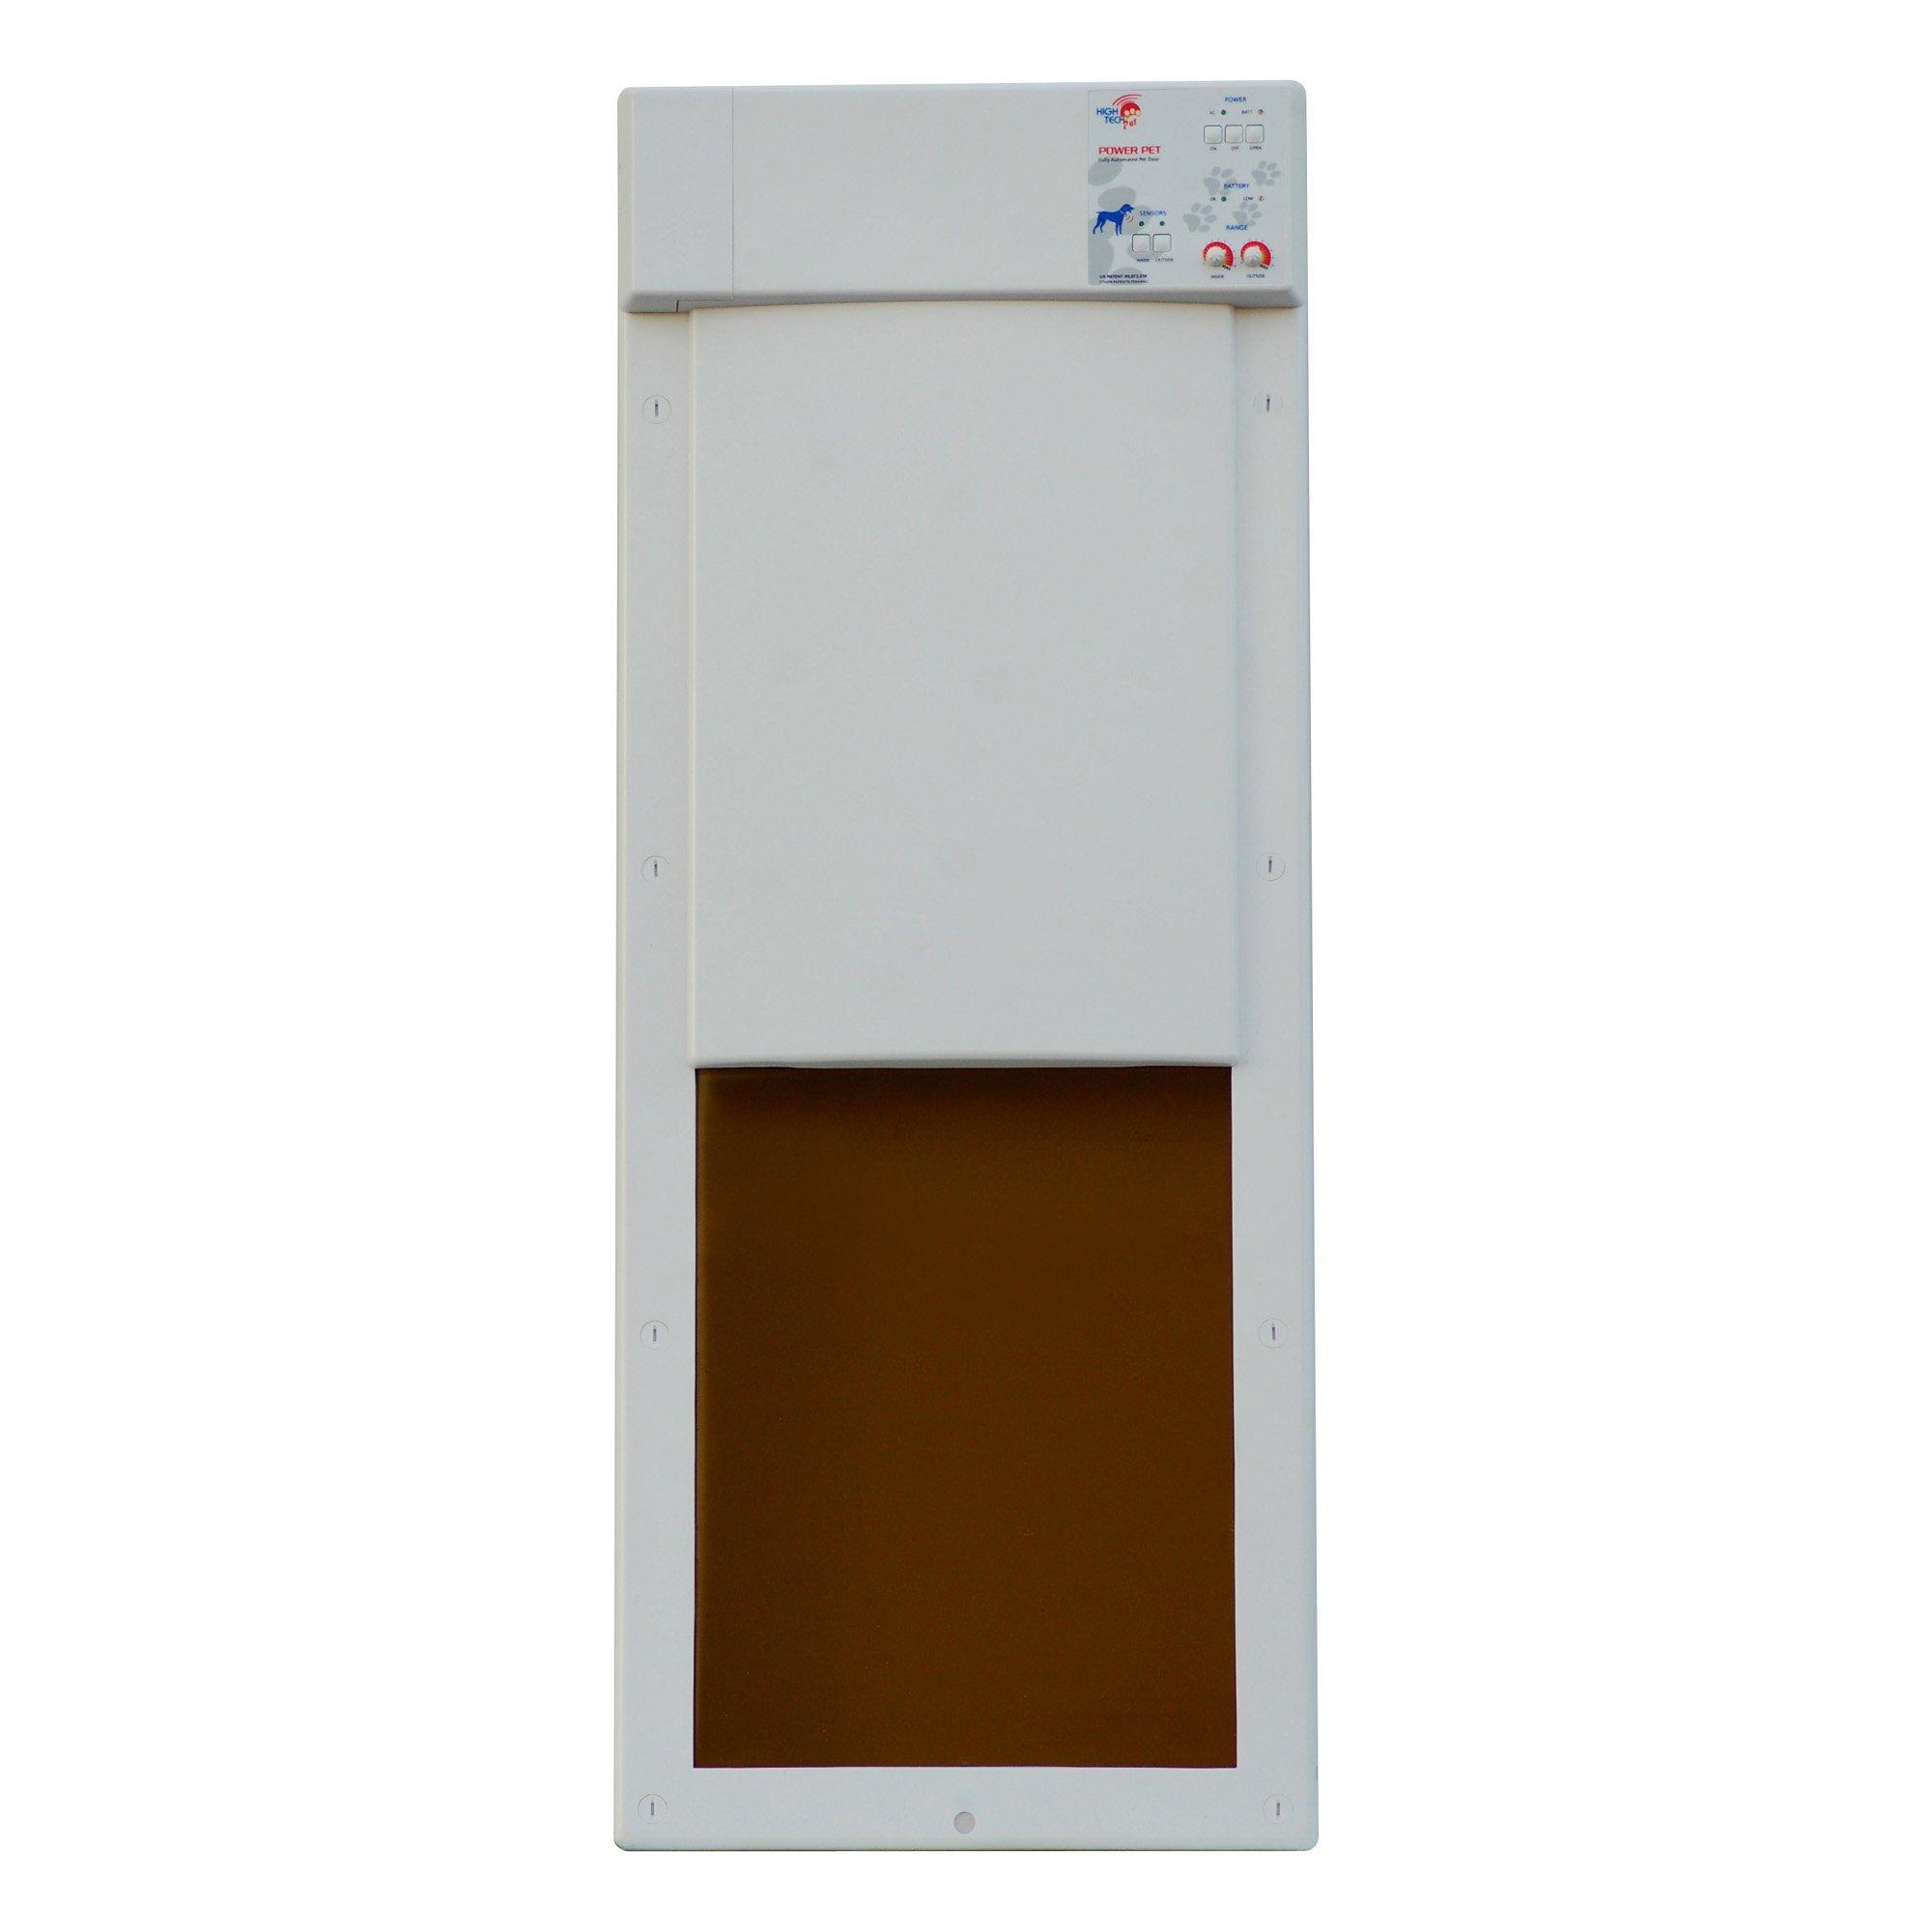 Power Pet Large Electronic Pet Door PX-2 by High Tech Pet